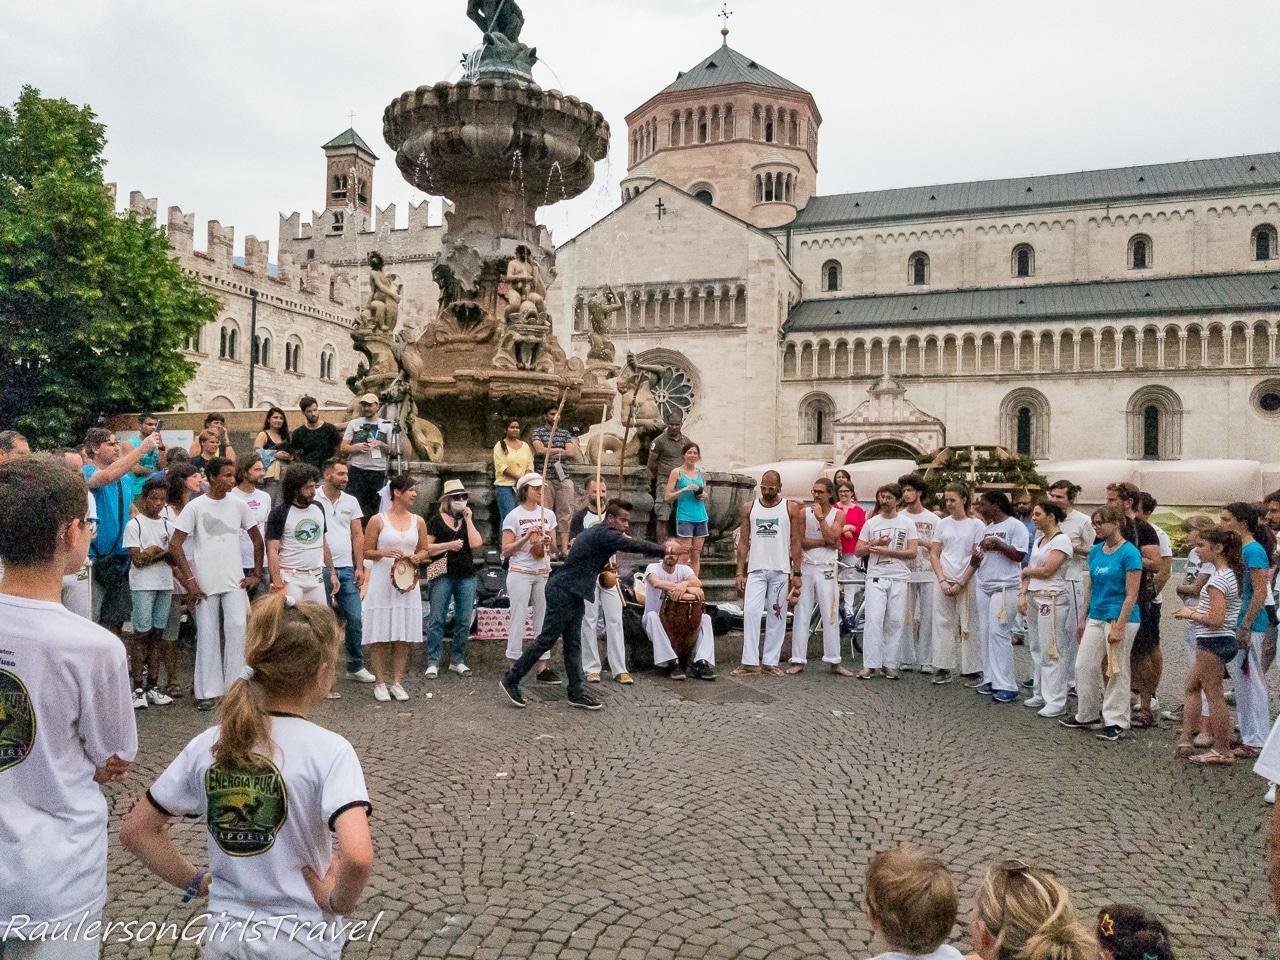 Associazone Capoeira Trento wedding celebration